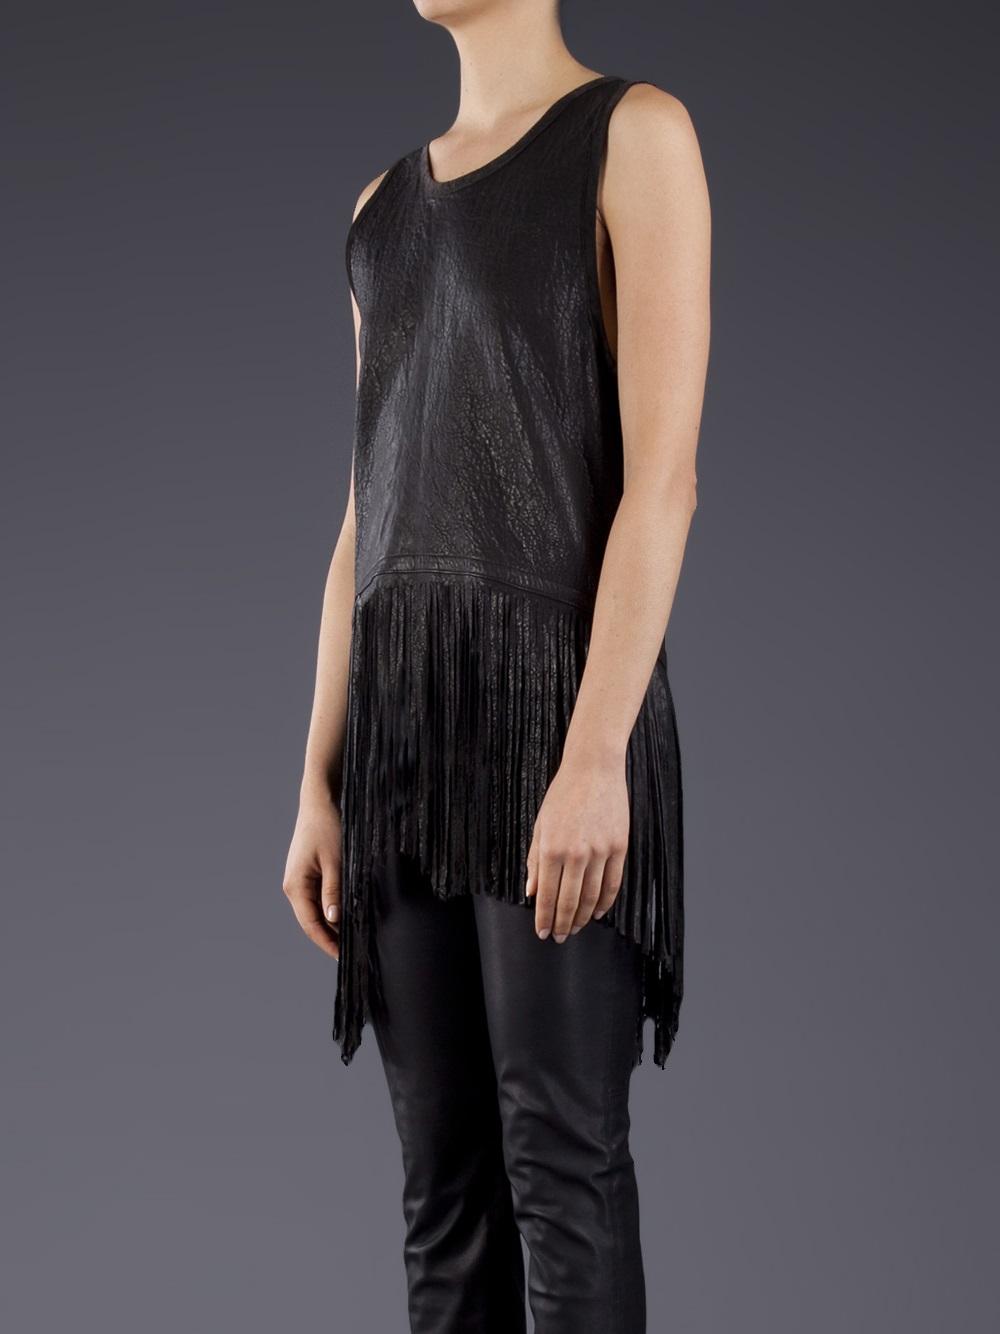 Erro Leather Fringe Top In Black Lyst